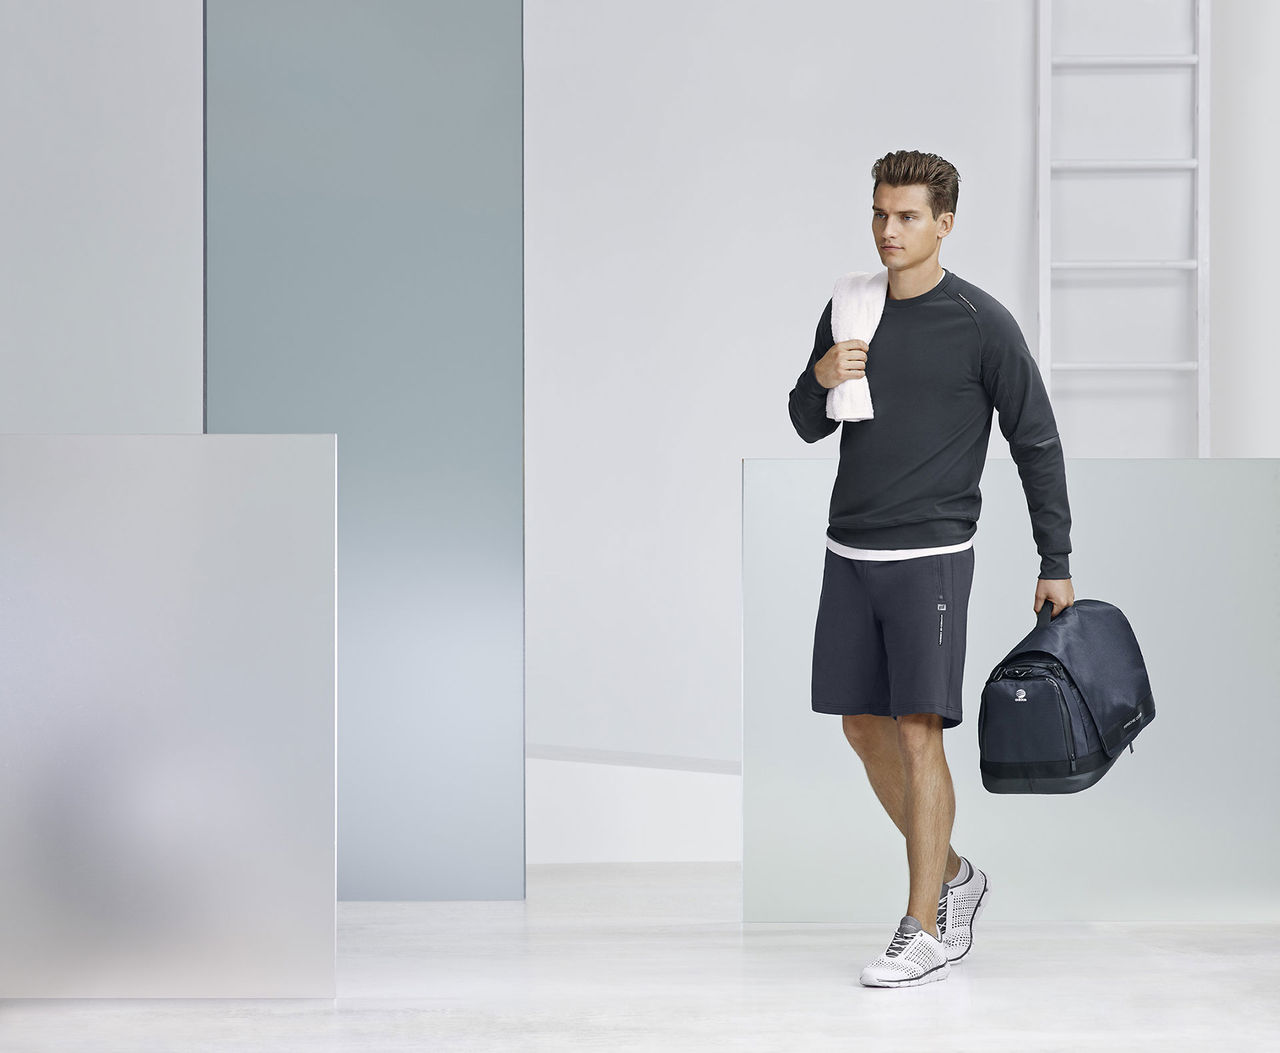 Adidas + Porsche Design